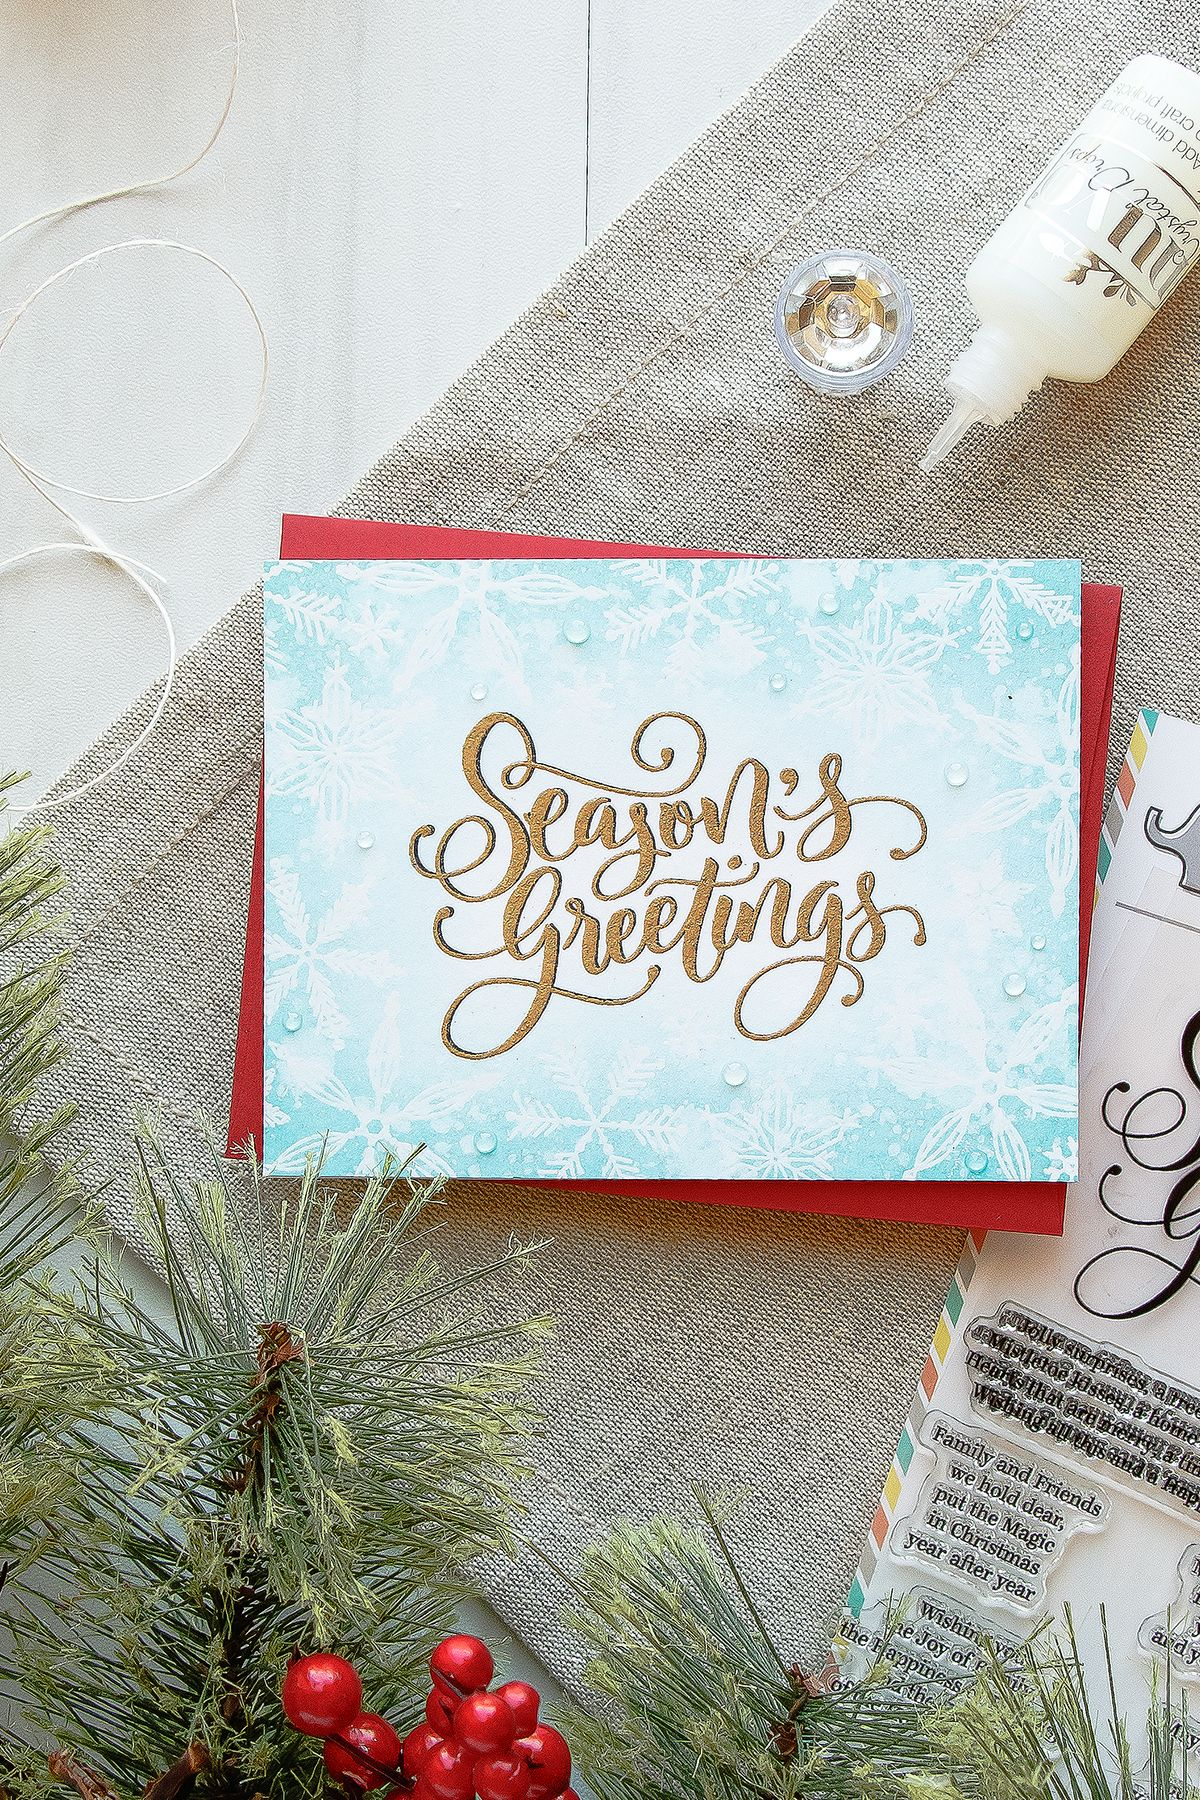 Mama Elephant Seasons Greetings Christmas Snowflakes Card By Yana